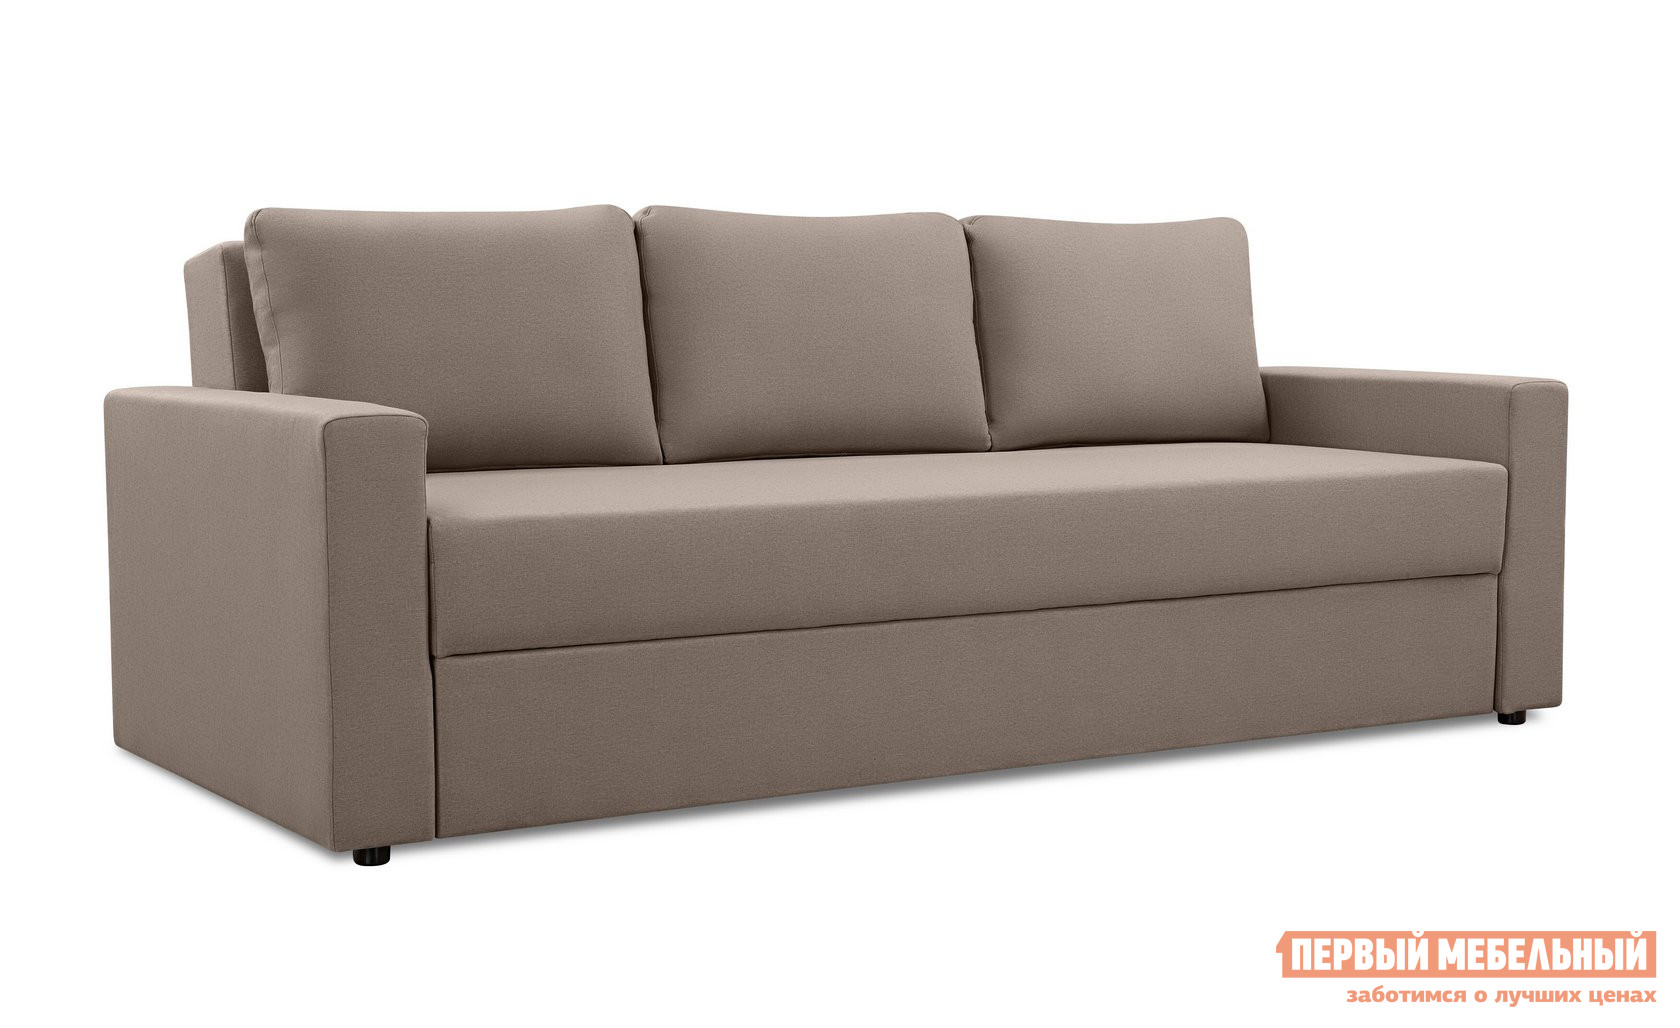 П диван в  Москве